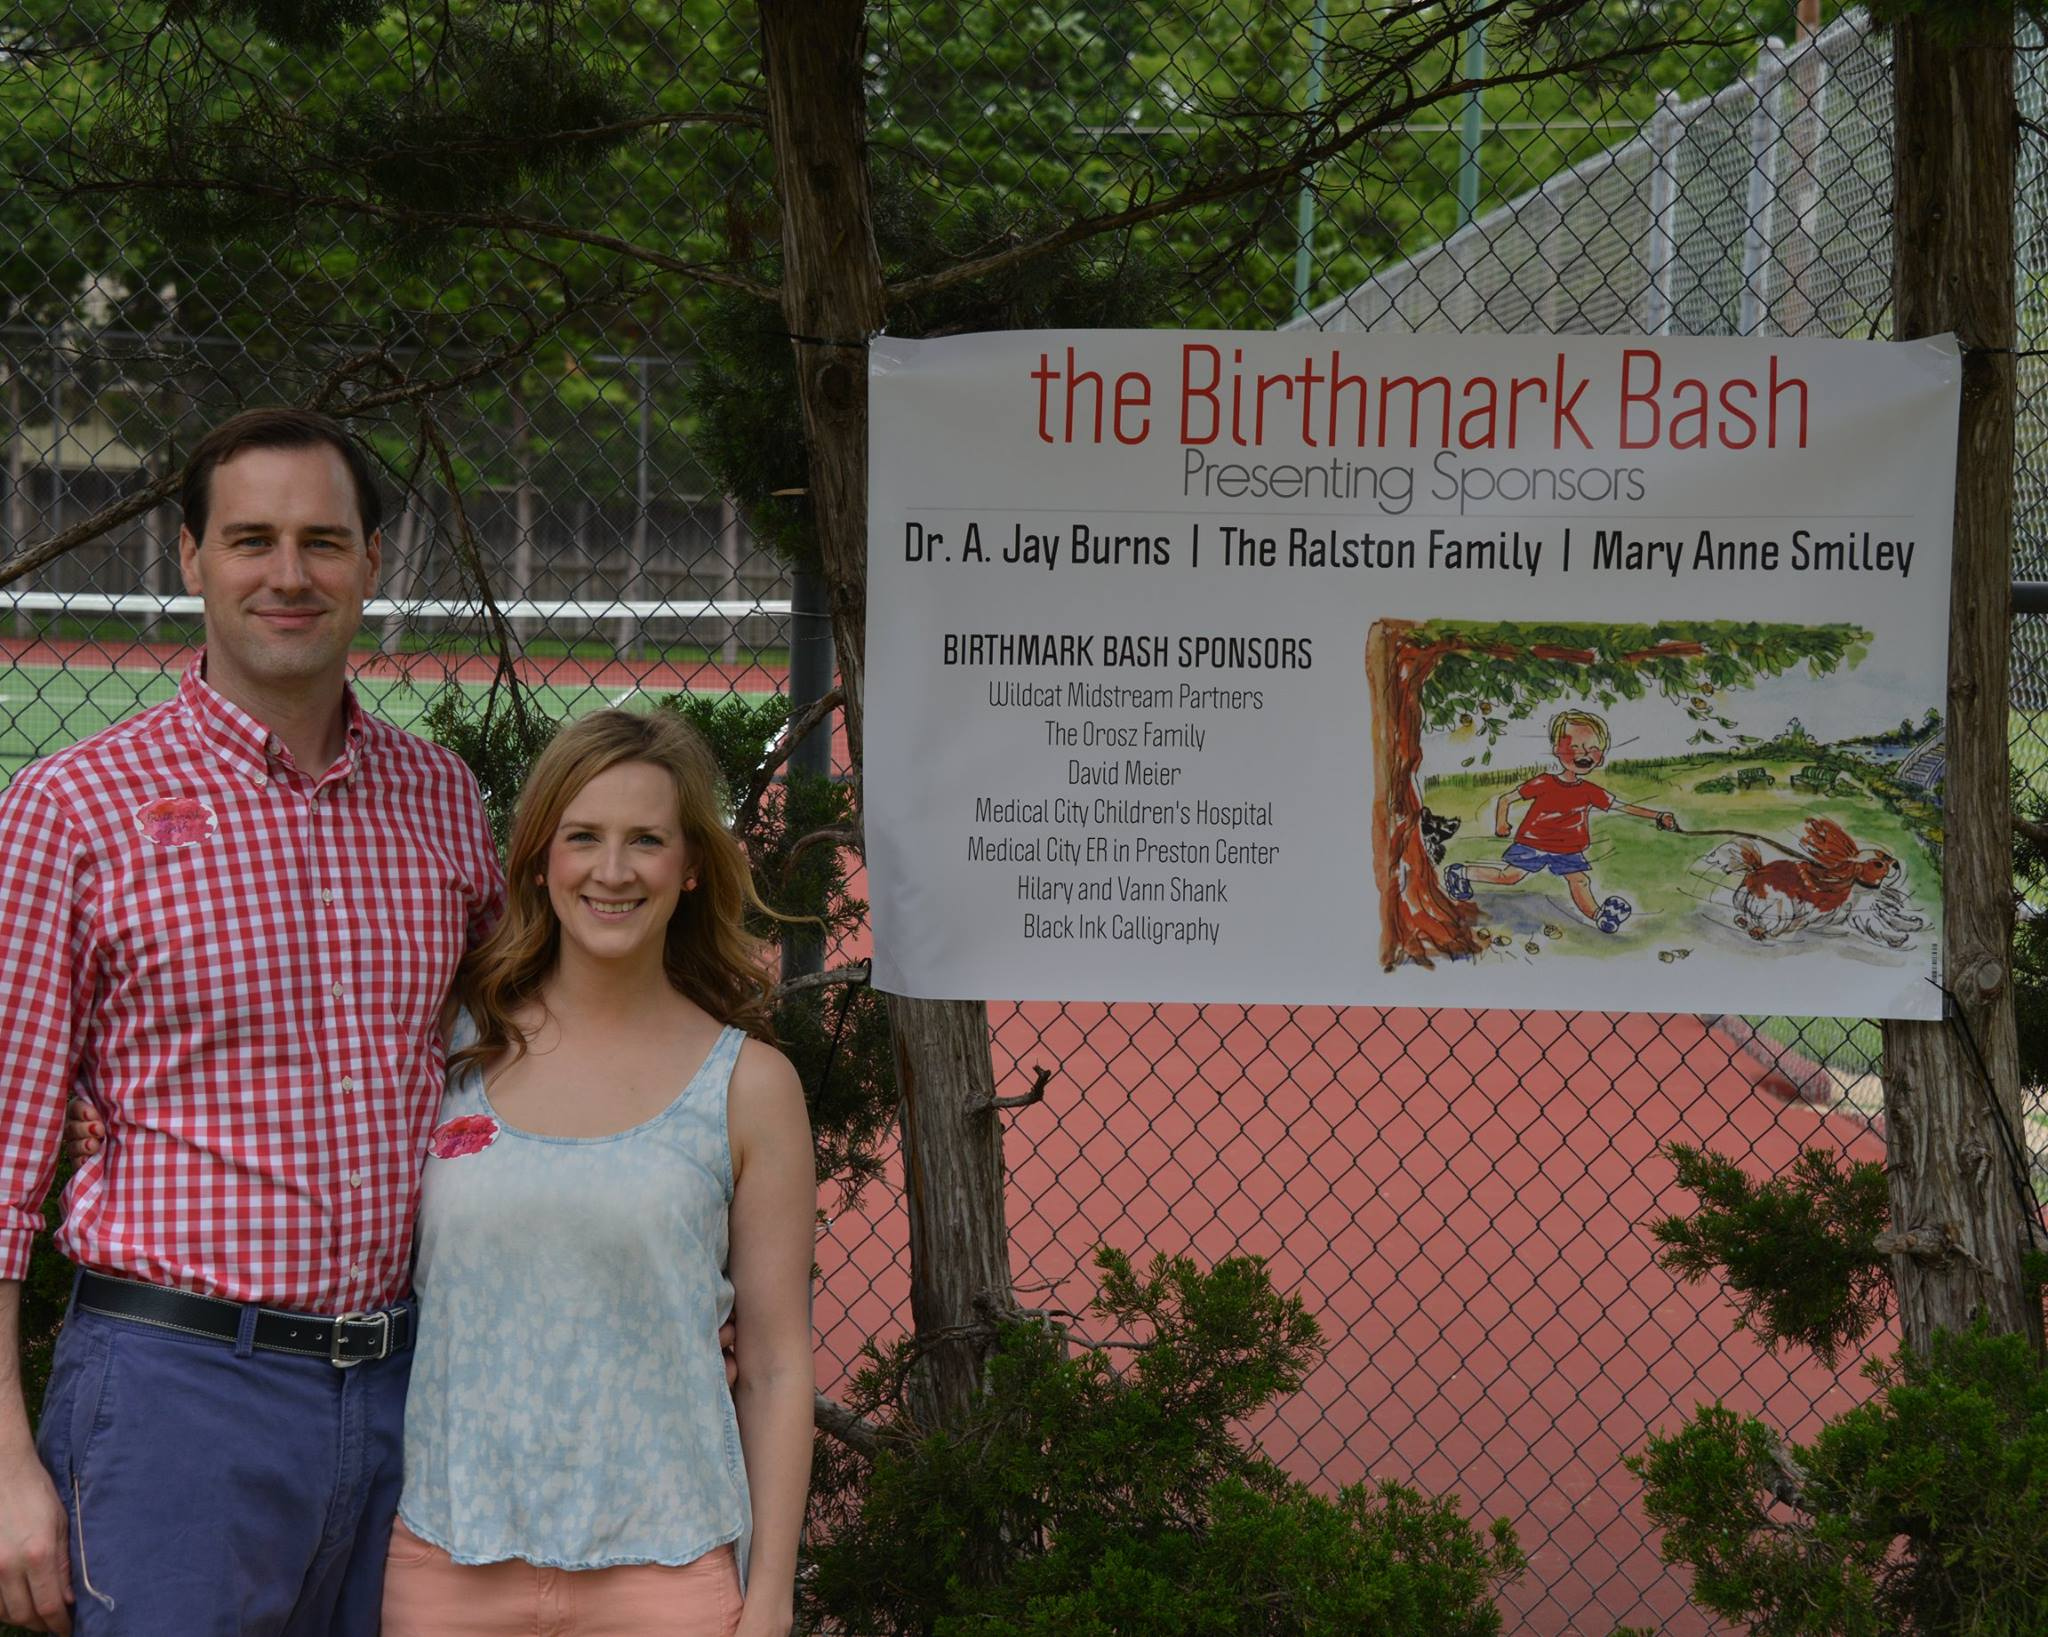 Birthmark Bash